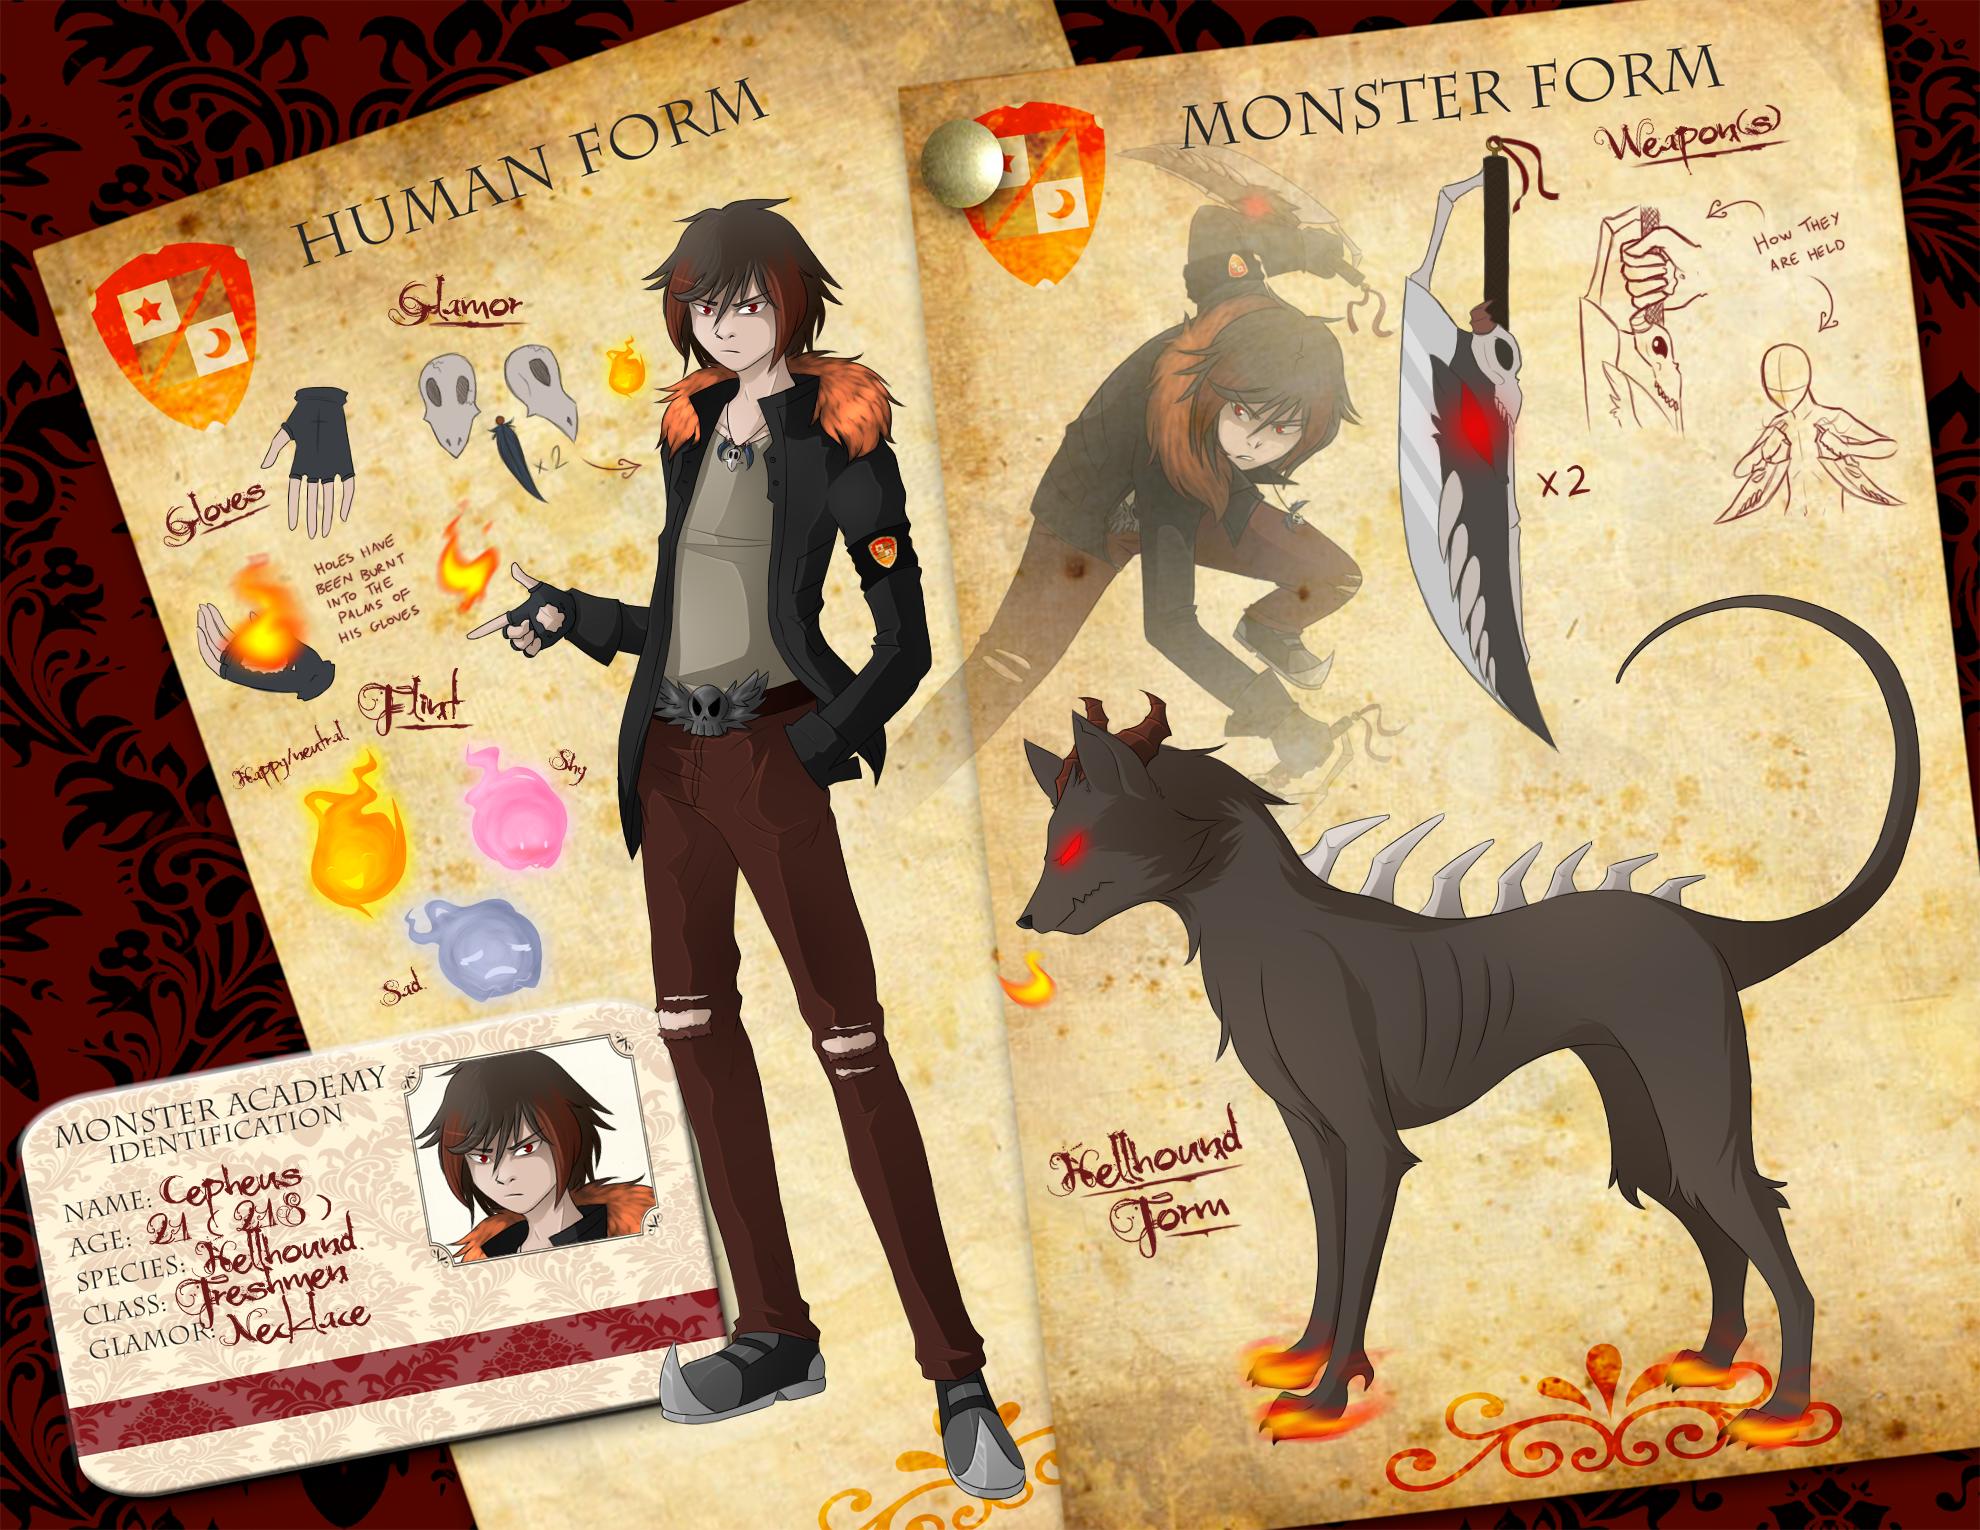 MA App - Cepheus the Hellhound by Maipee-Chan